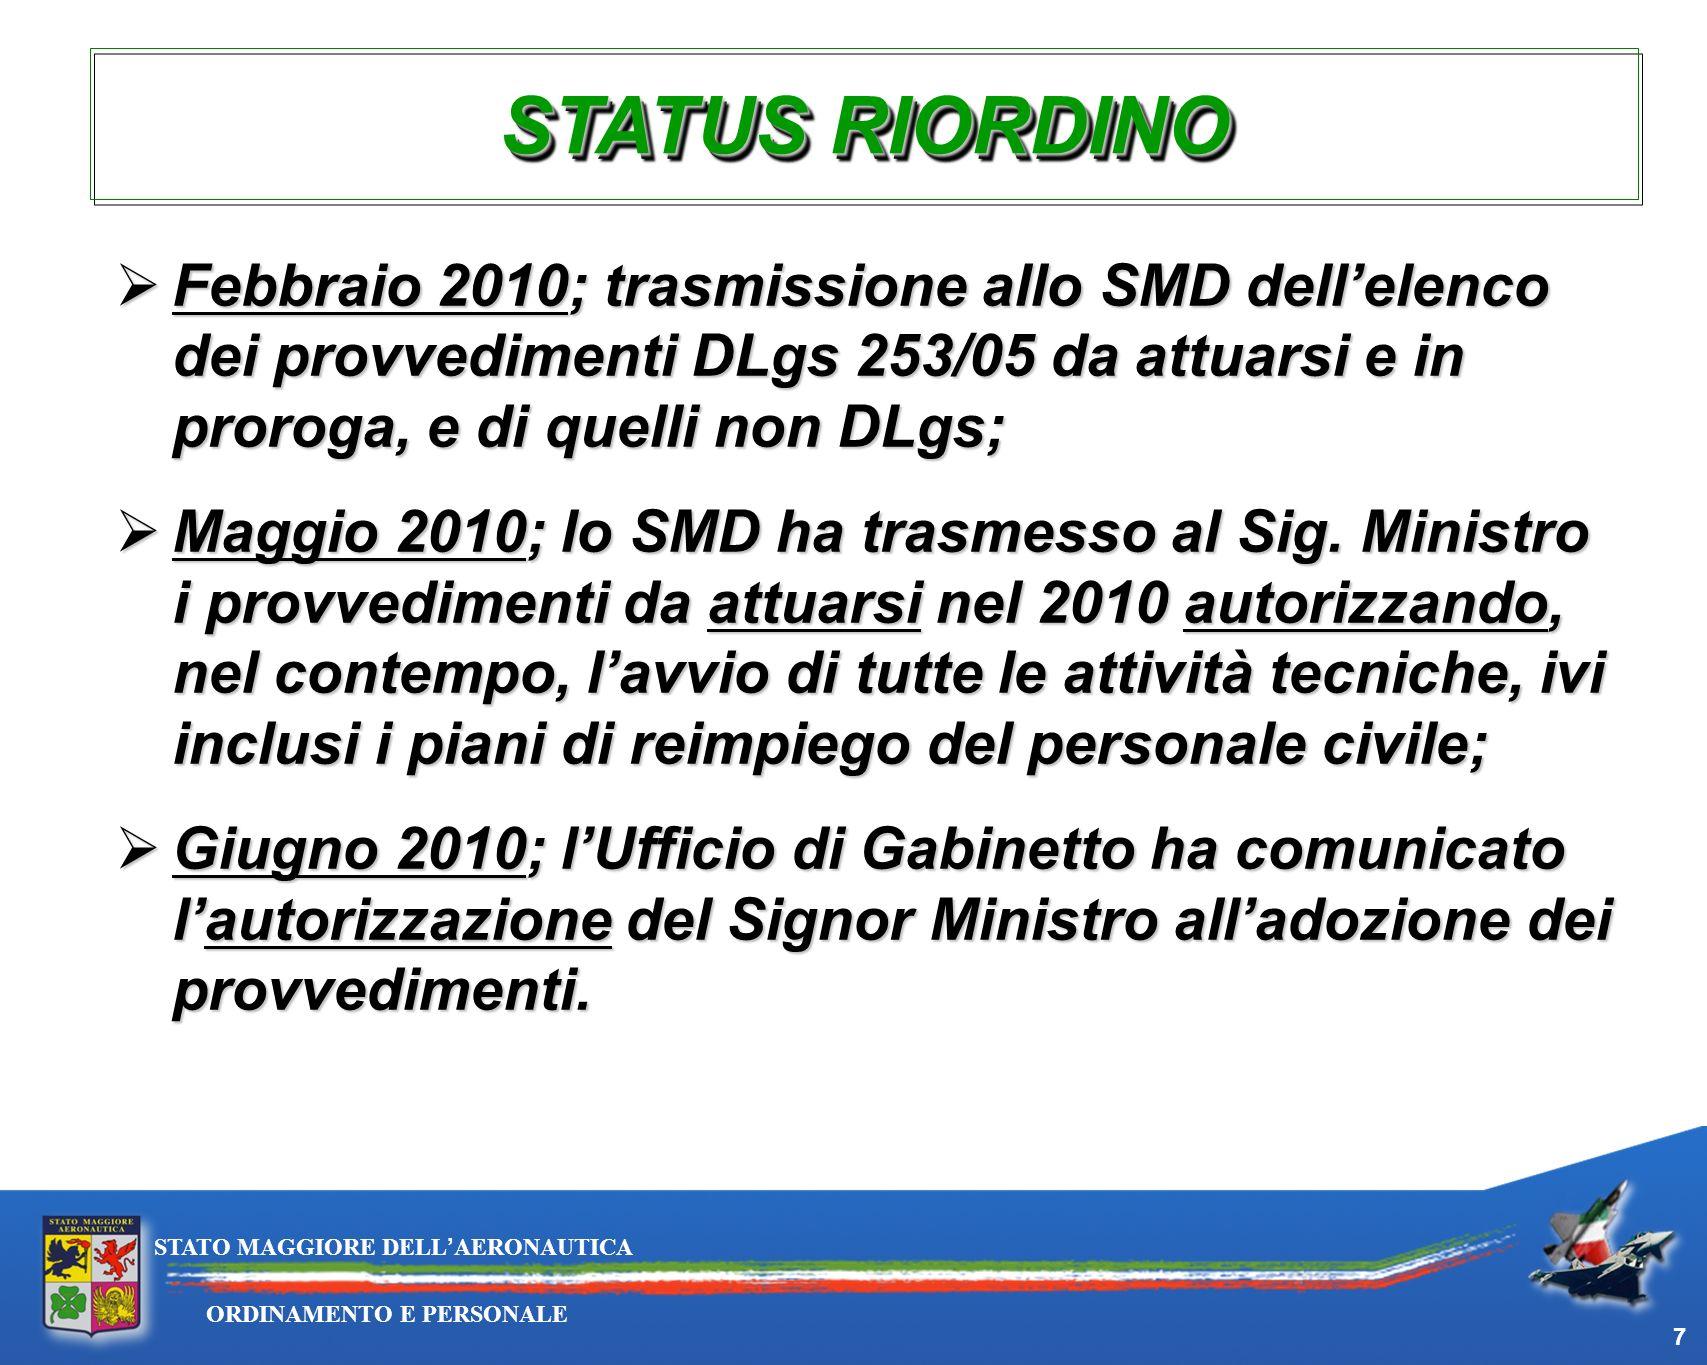 29/03/2017 STATUS RIORDINO.